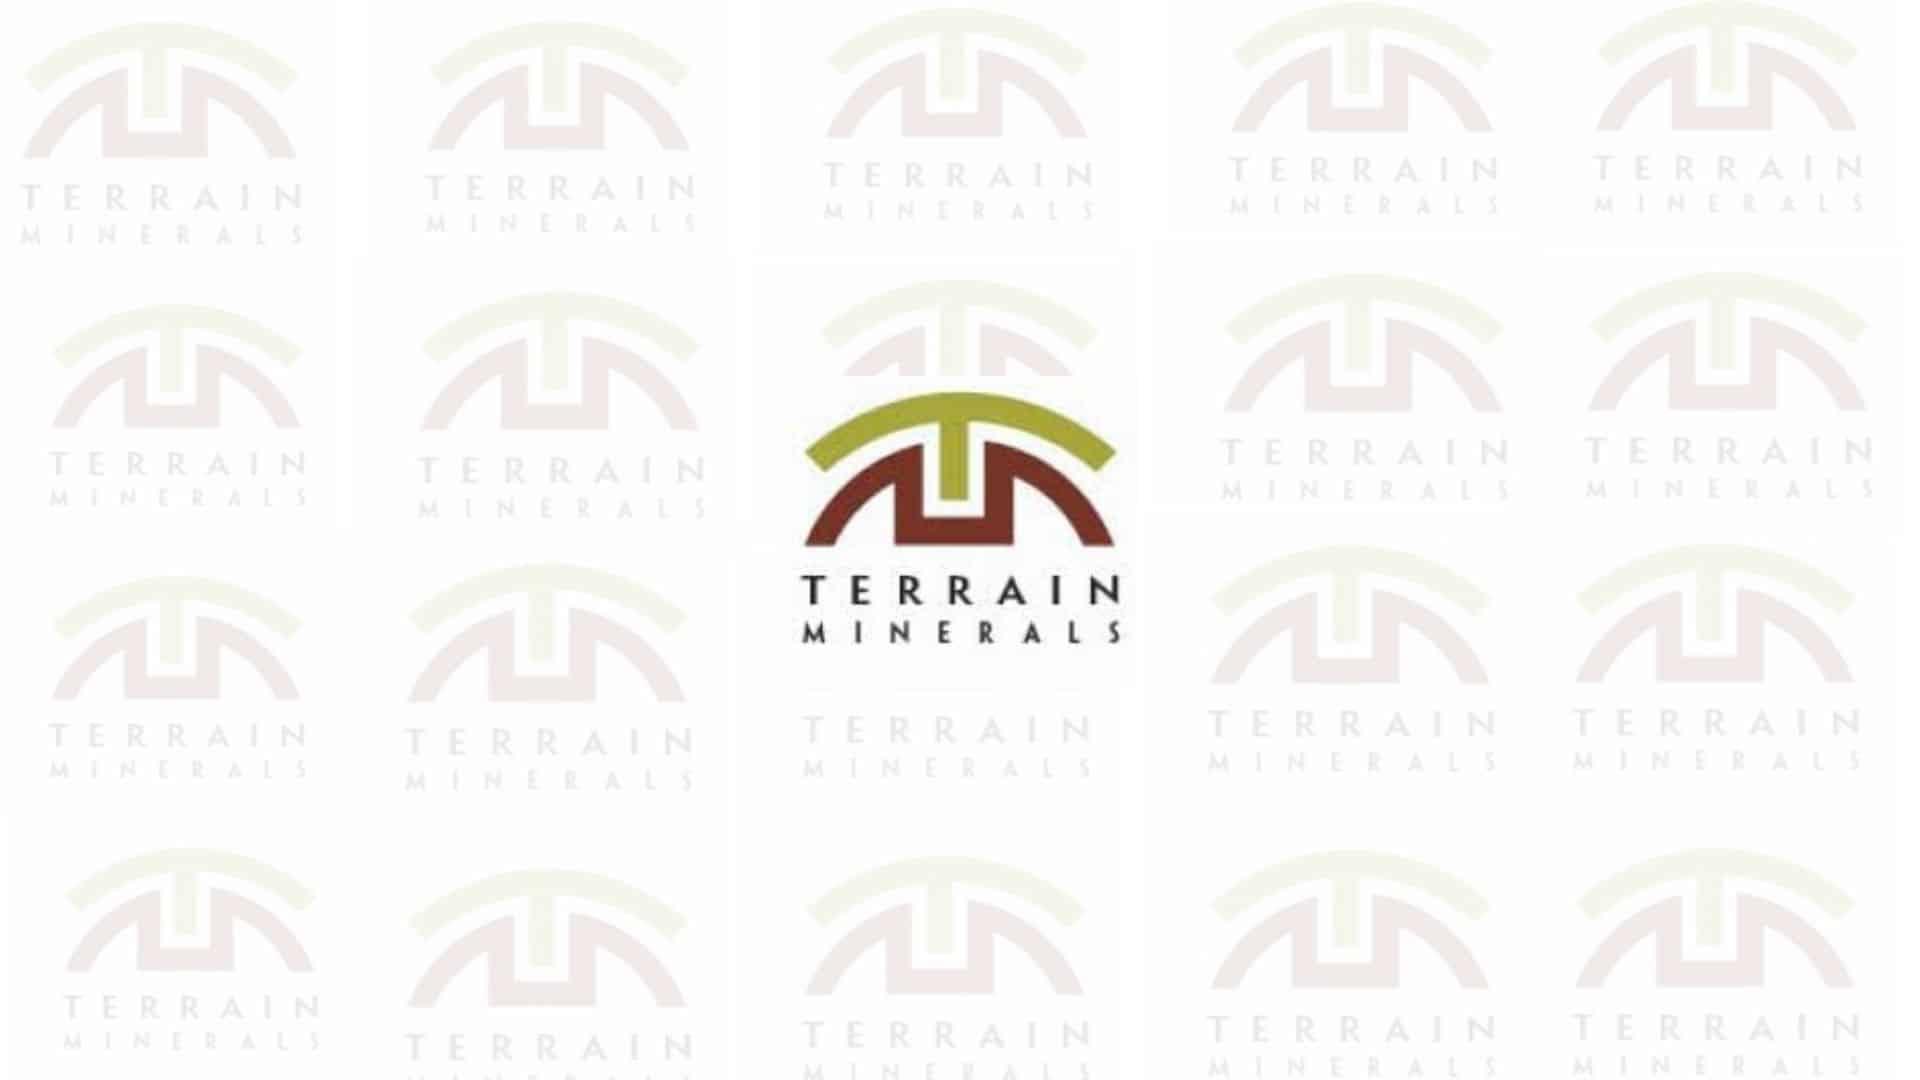 Terrain Minerals Plans to Acquire Smokebush Gold Project in Yalgoo Mineral Field